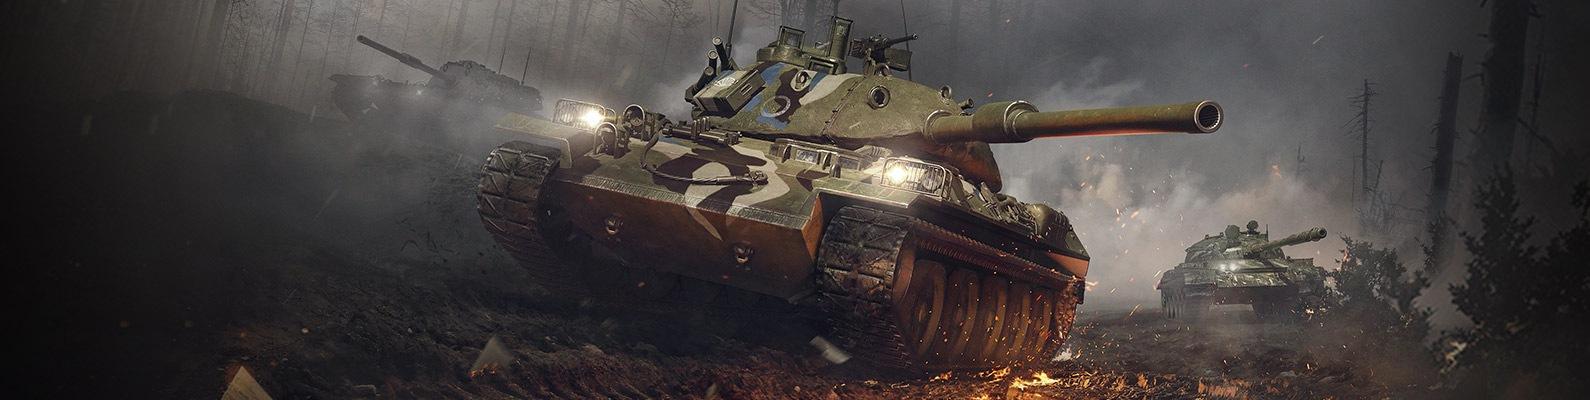 Картинки для кланов в world of tanks   подборка (24)